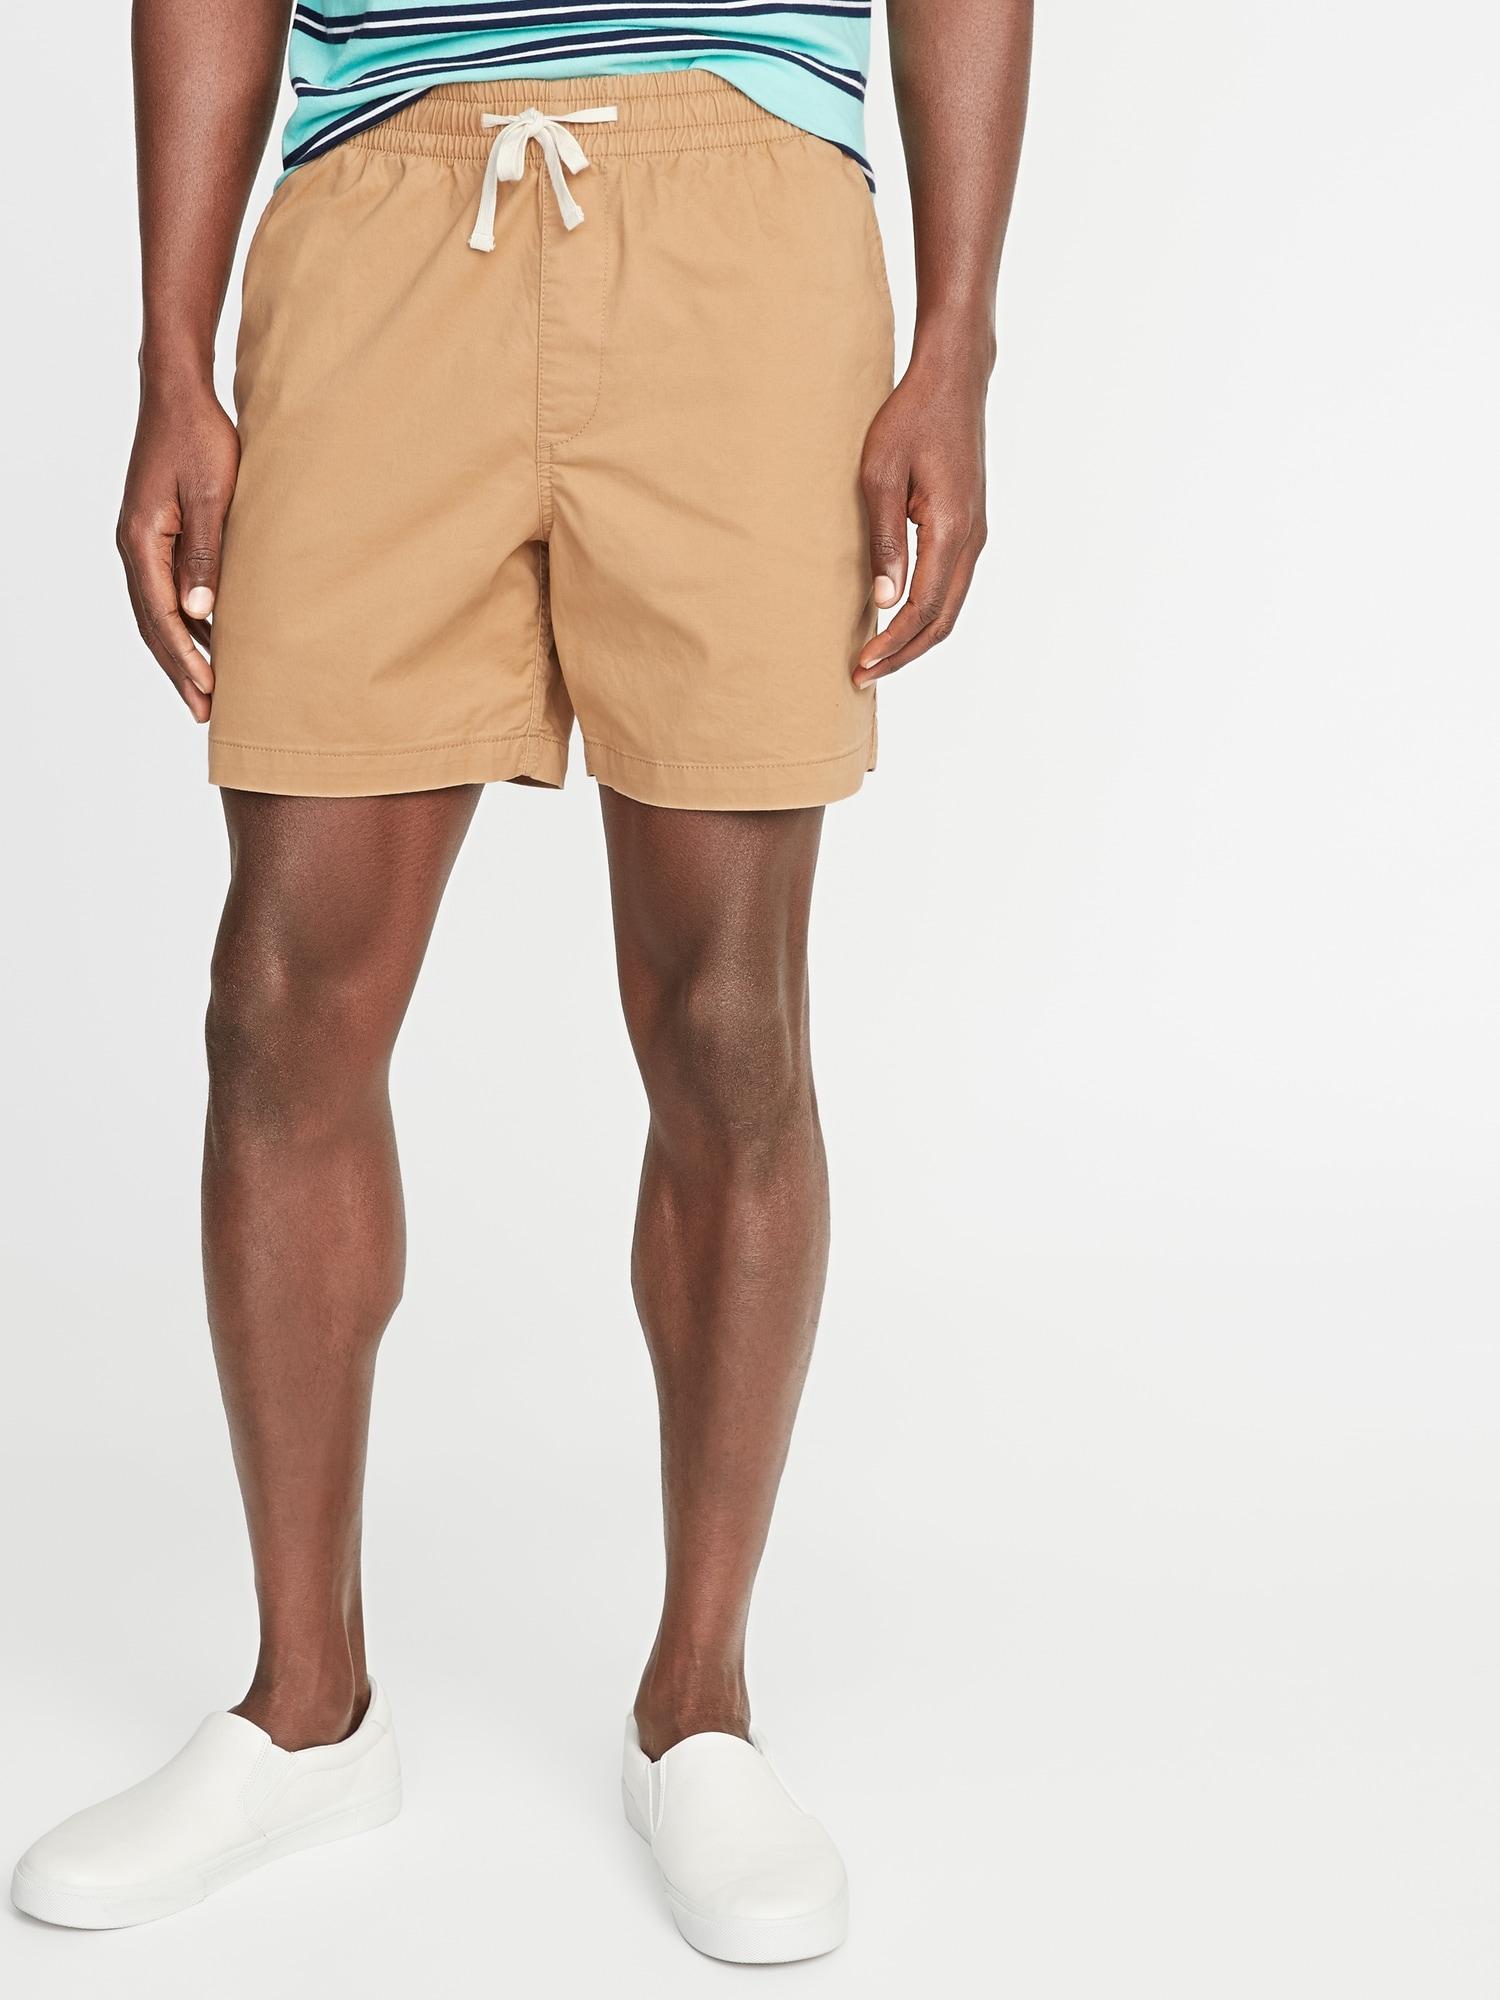 54e404eddc Built-In Flex Twill Jogger Shorts for Men - 7-inch inseam | Old Navy